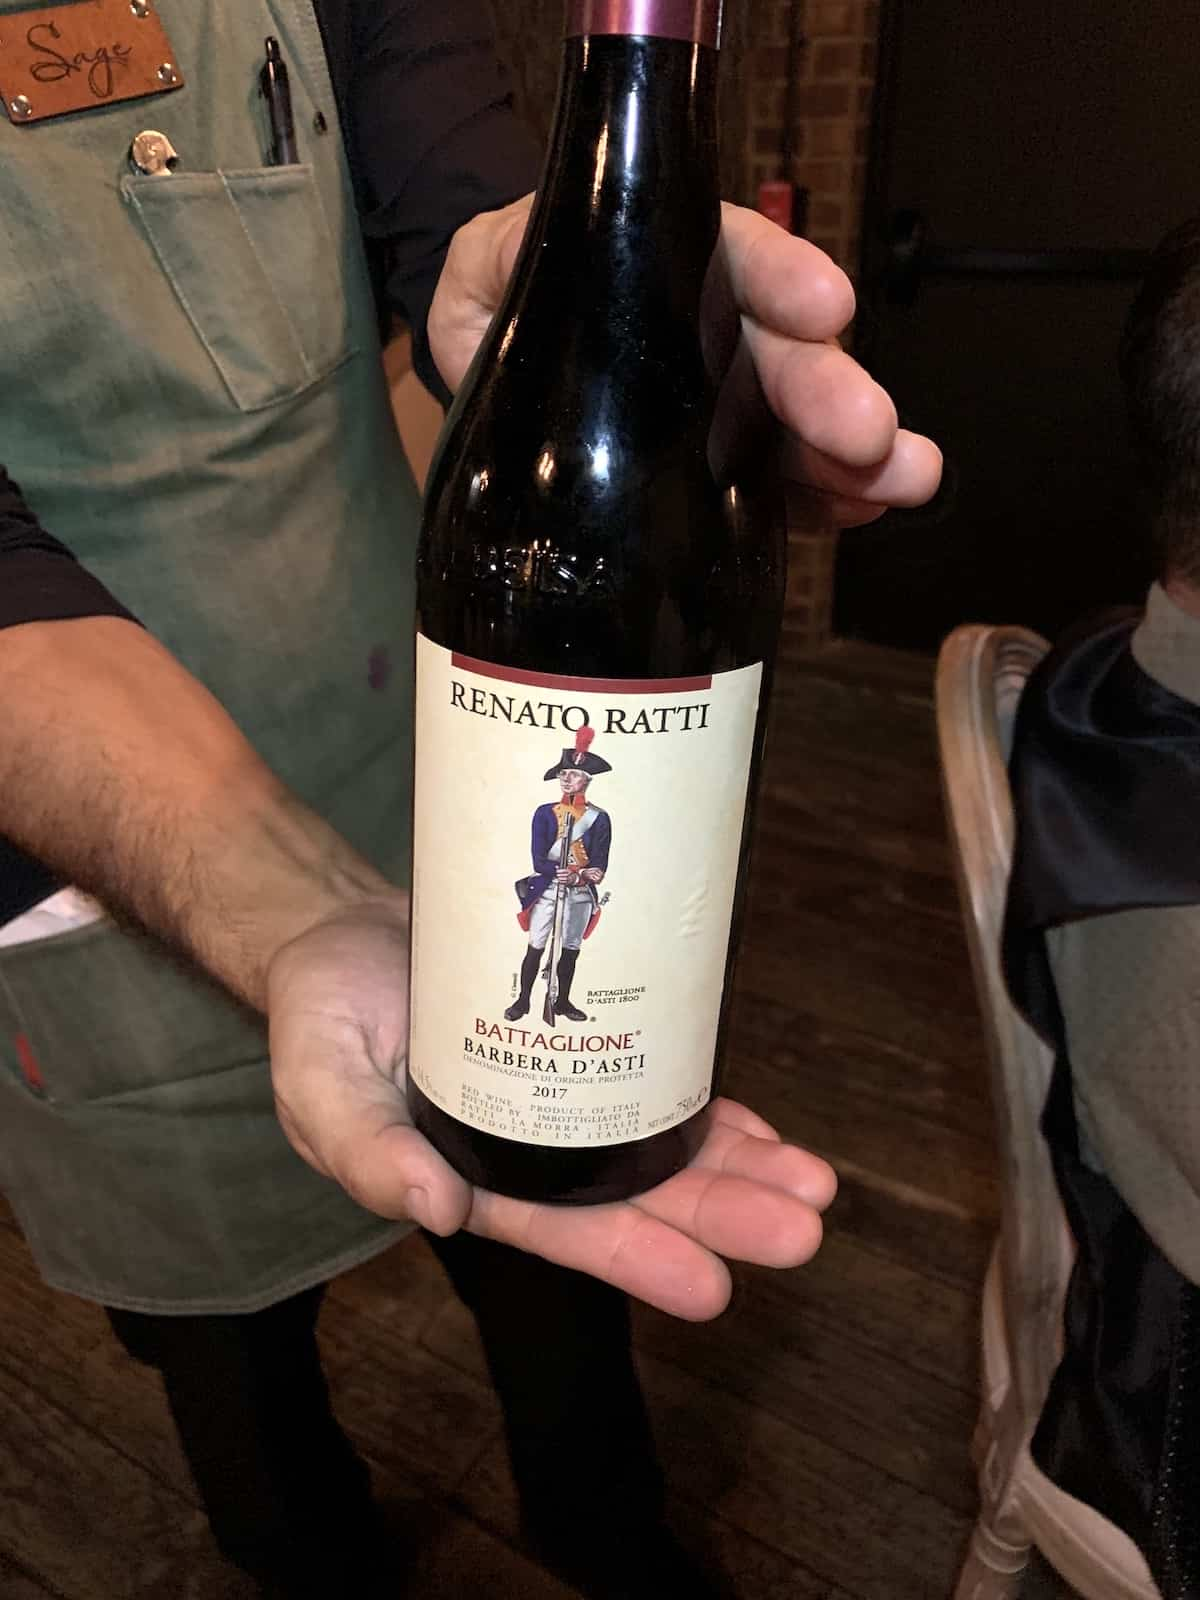 Bottle of Rnato Ratti wine.